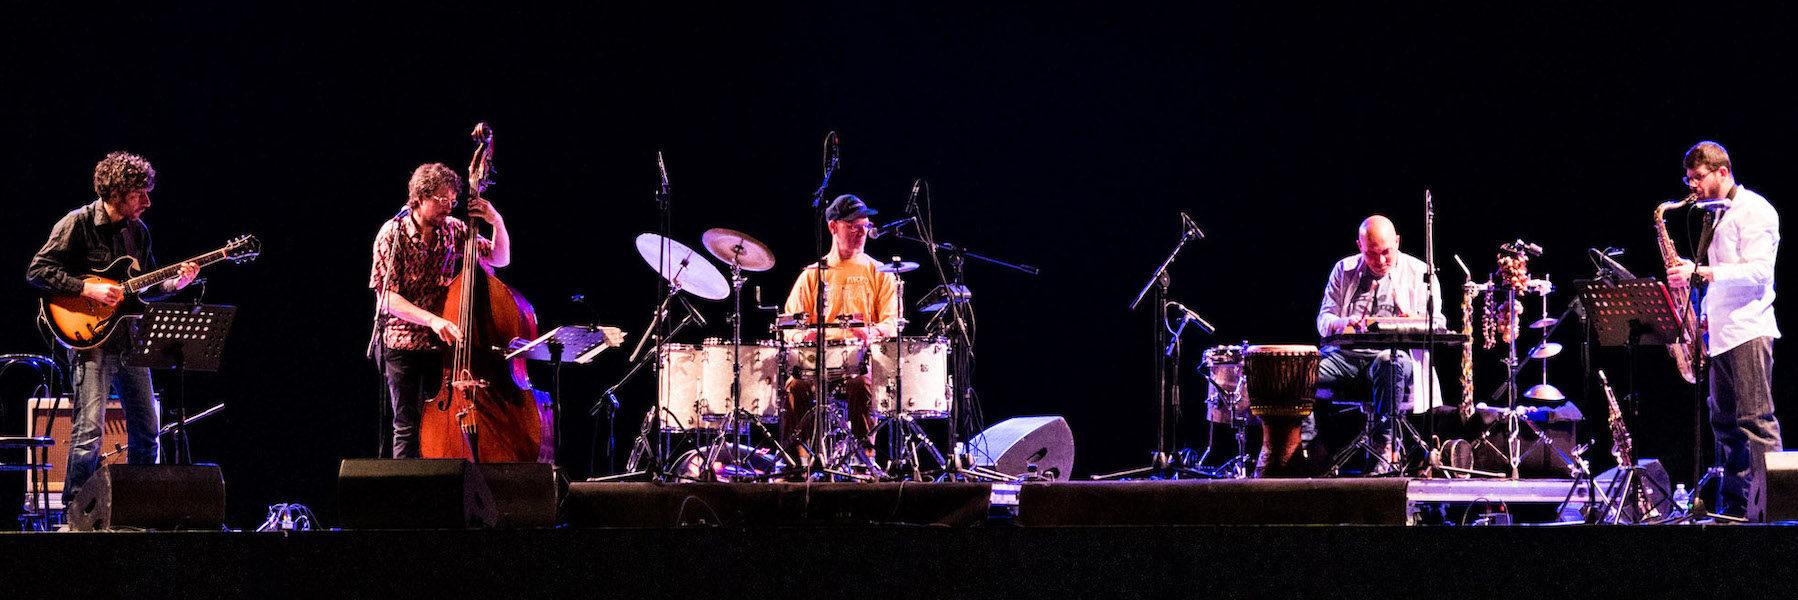 Arto Tunçboyacıyan + SFOM quartet